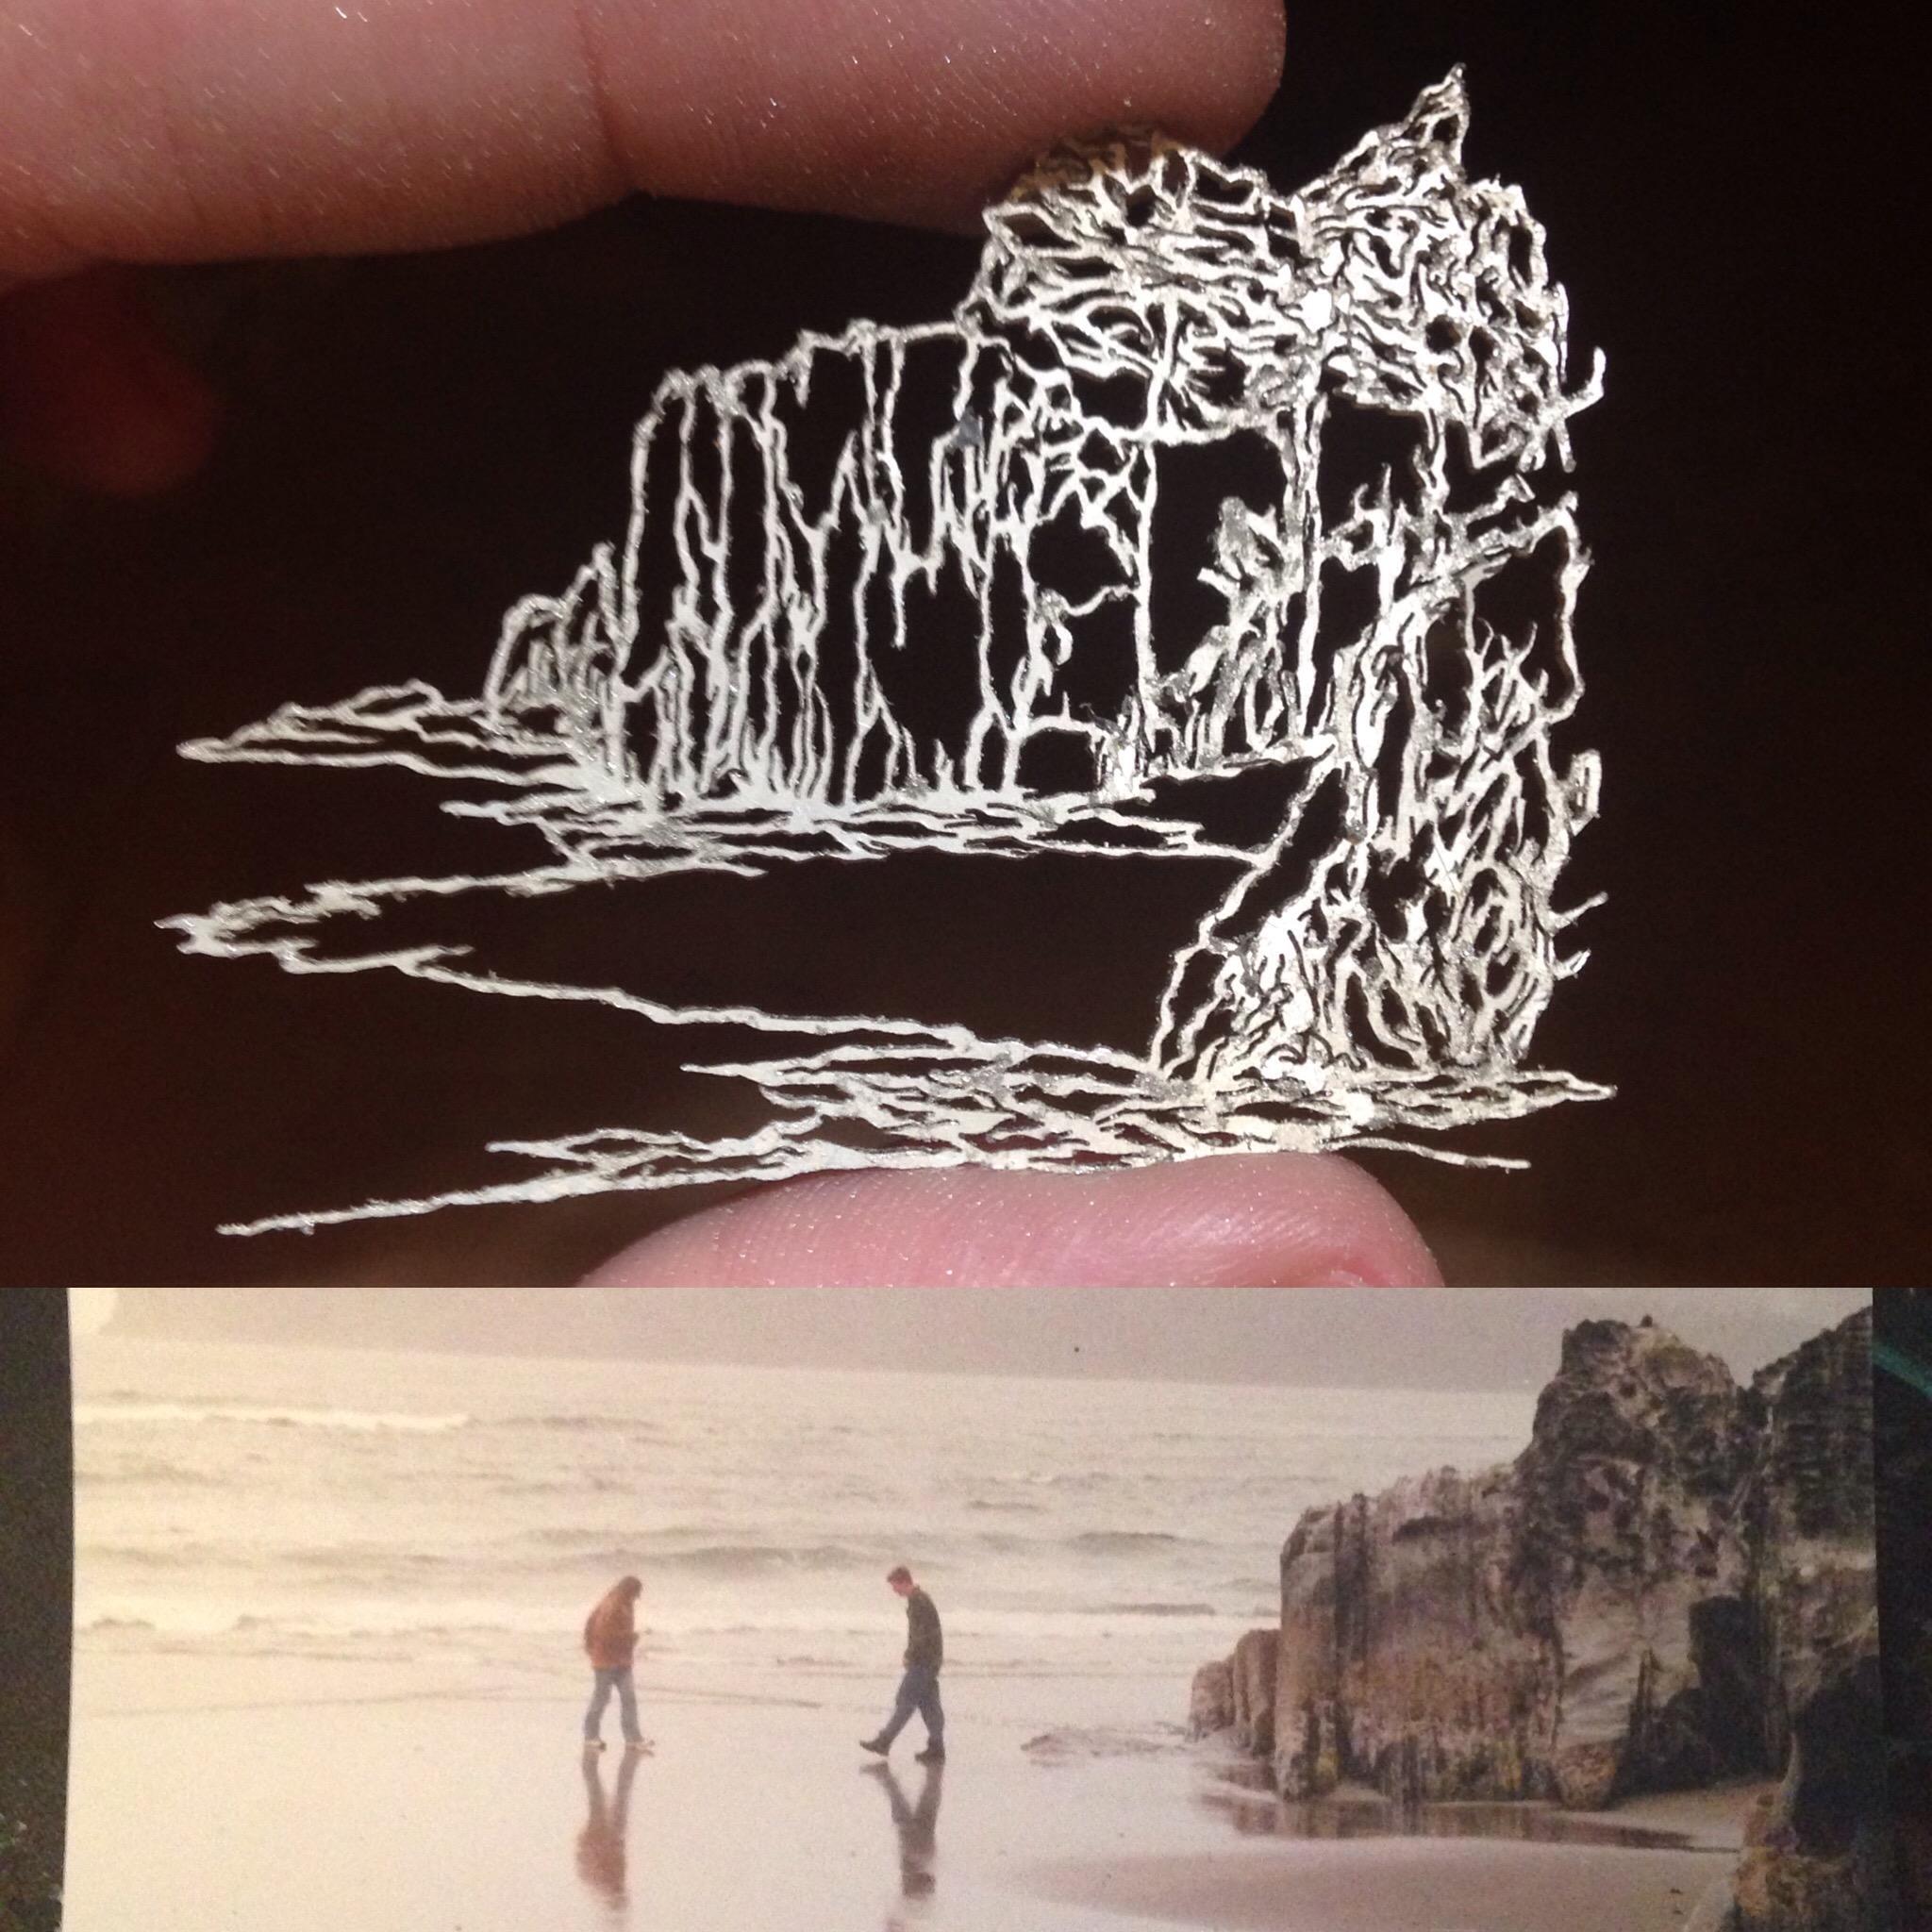 Beachwalkers, Boulders in progress